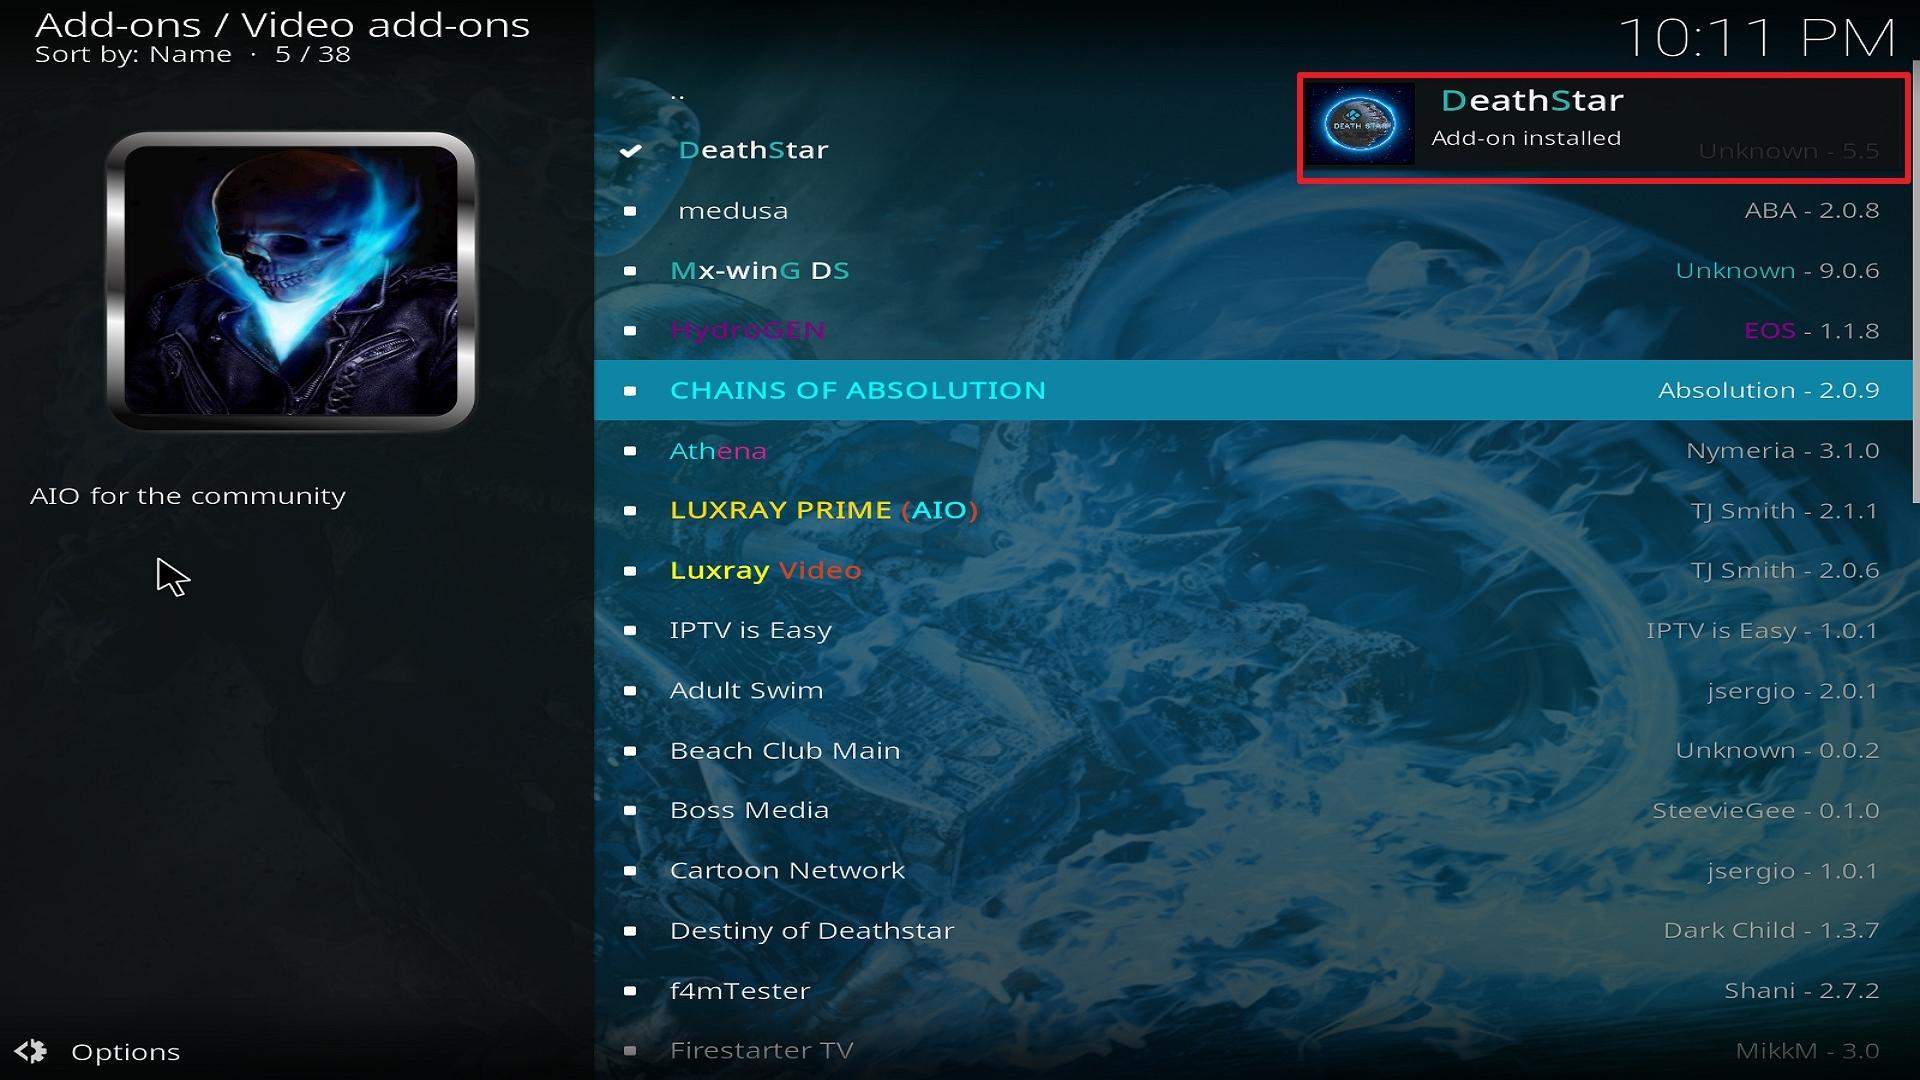 Destiny of Deathstar install step 25